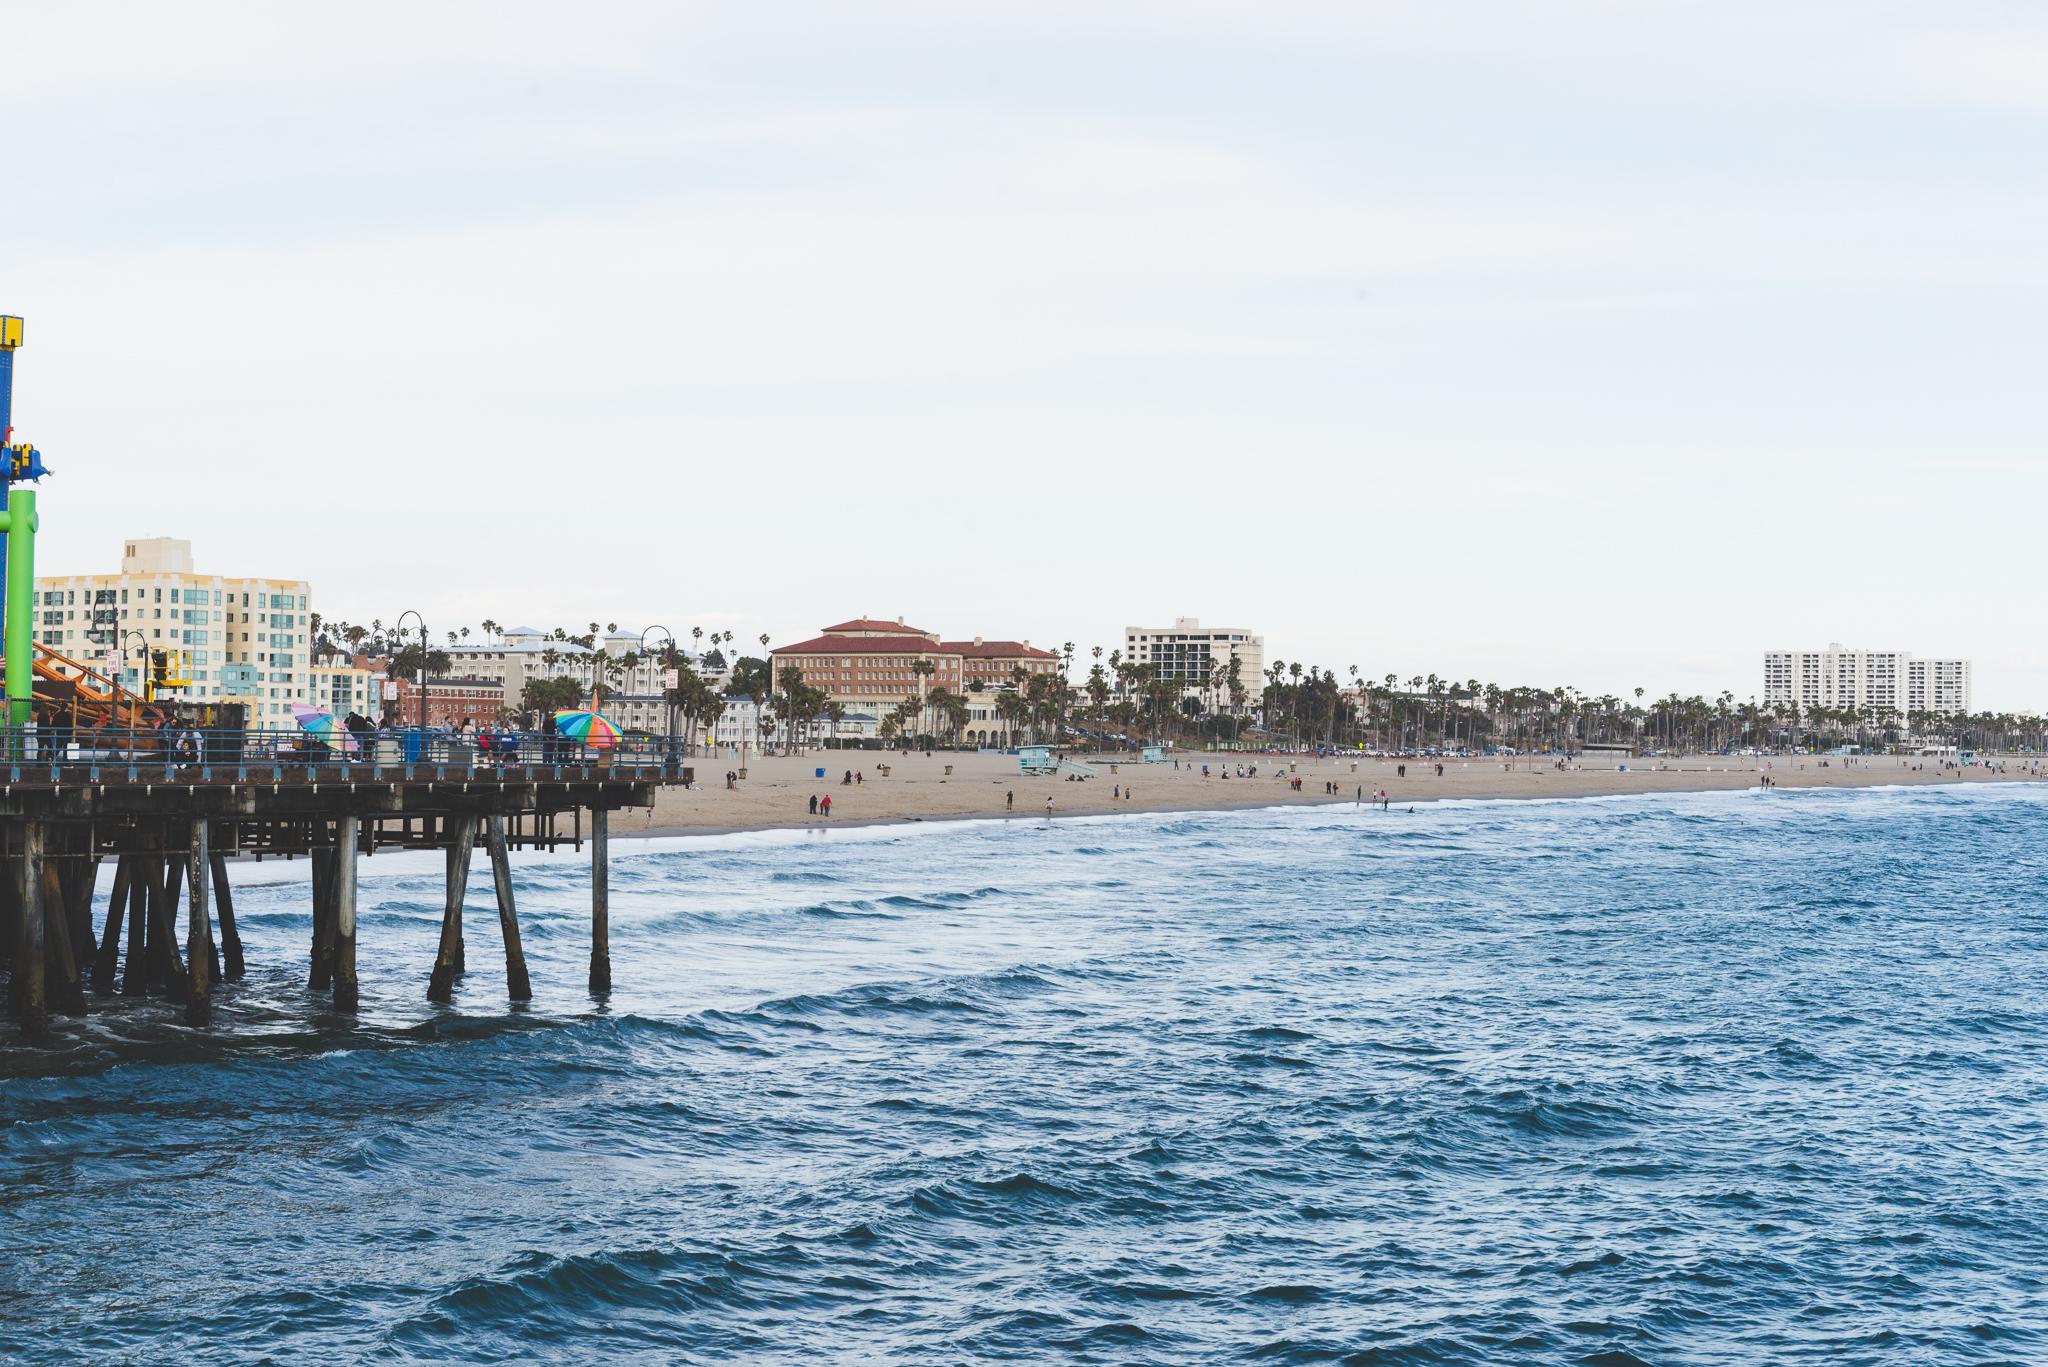 Santa Monica, seen from the pier. / 5/7/16 / Santa Monica, CA